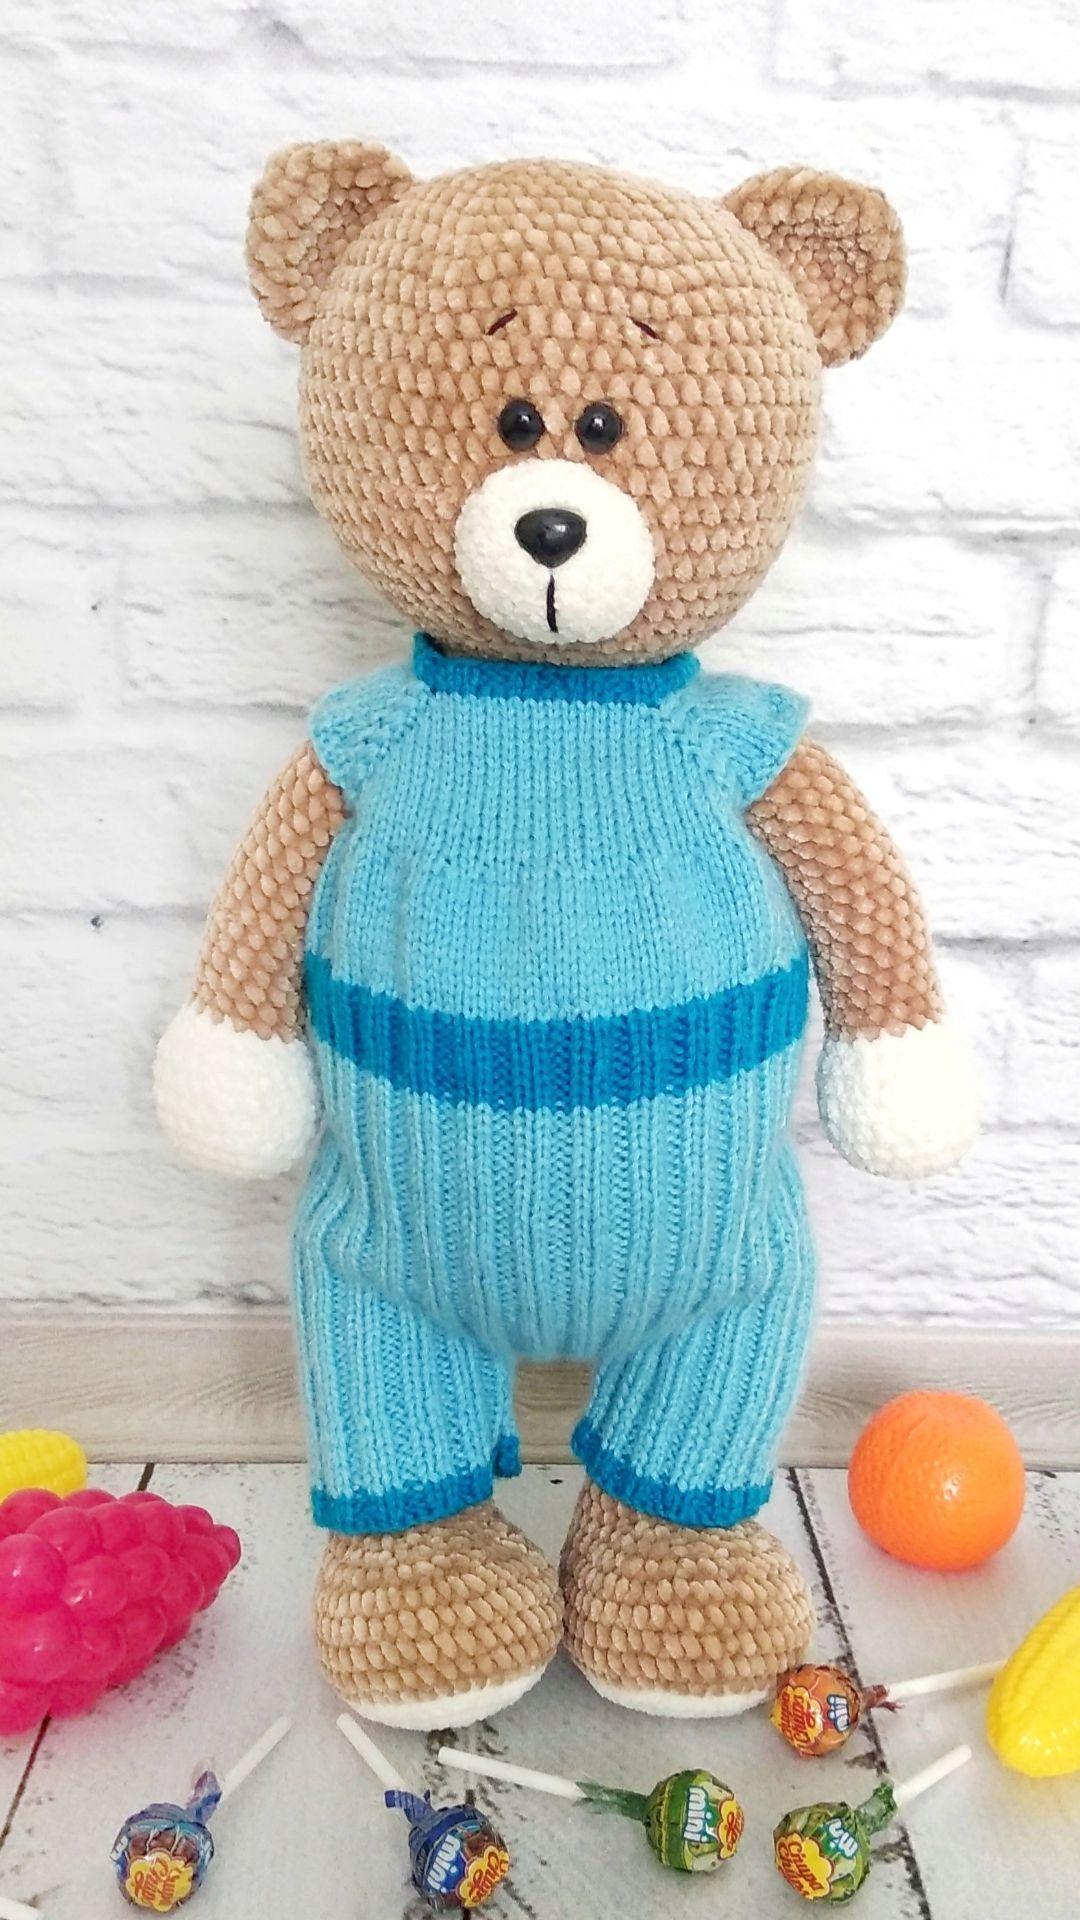 Crochet toy Teddy Bear Toy Crochet Teddy Bear Amigurumi animals Amigurumi Bear Amigurumi Knitted toy Ready to ship